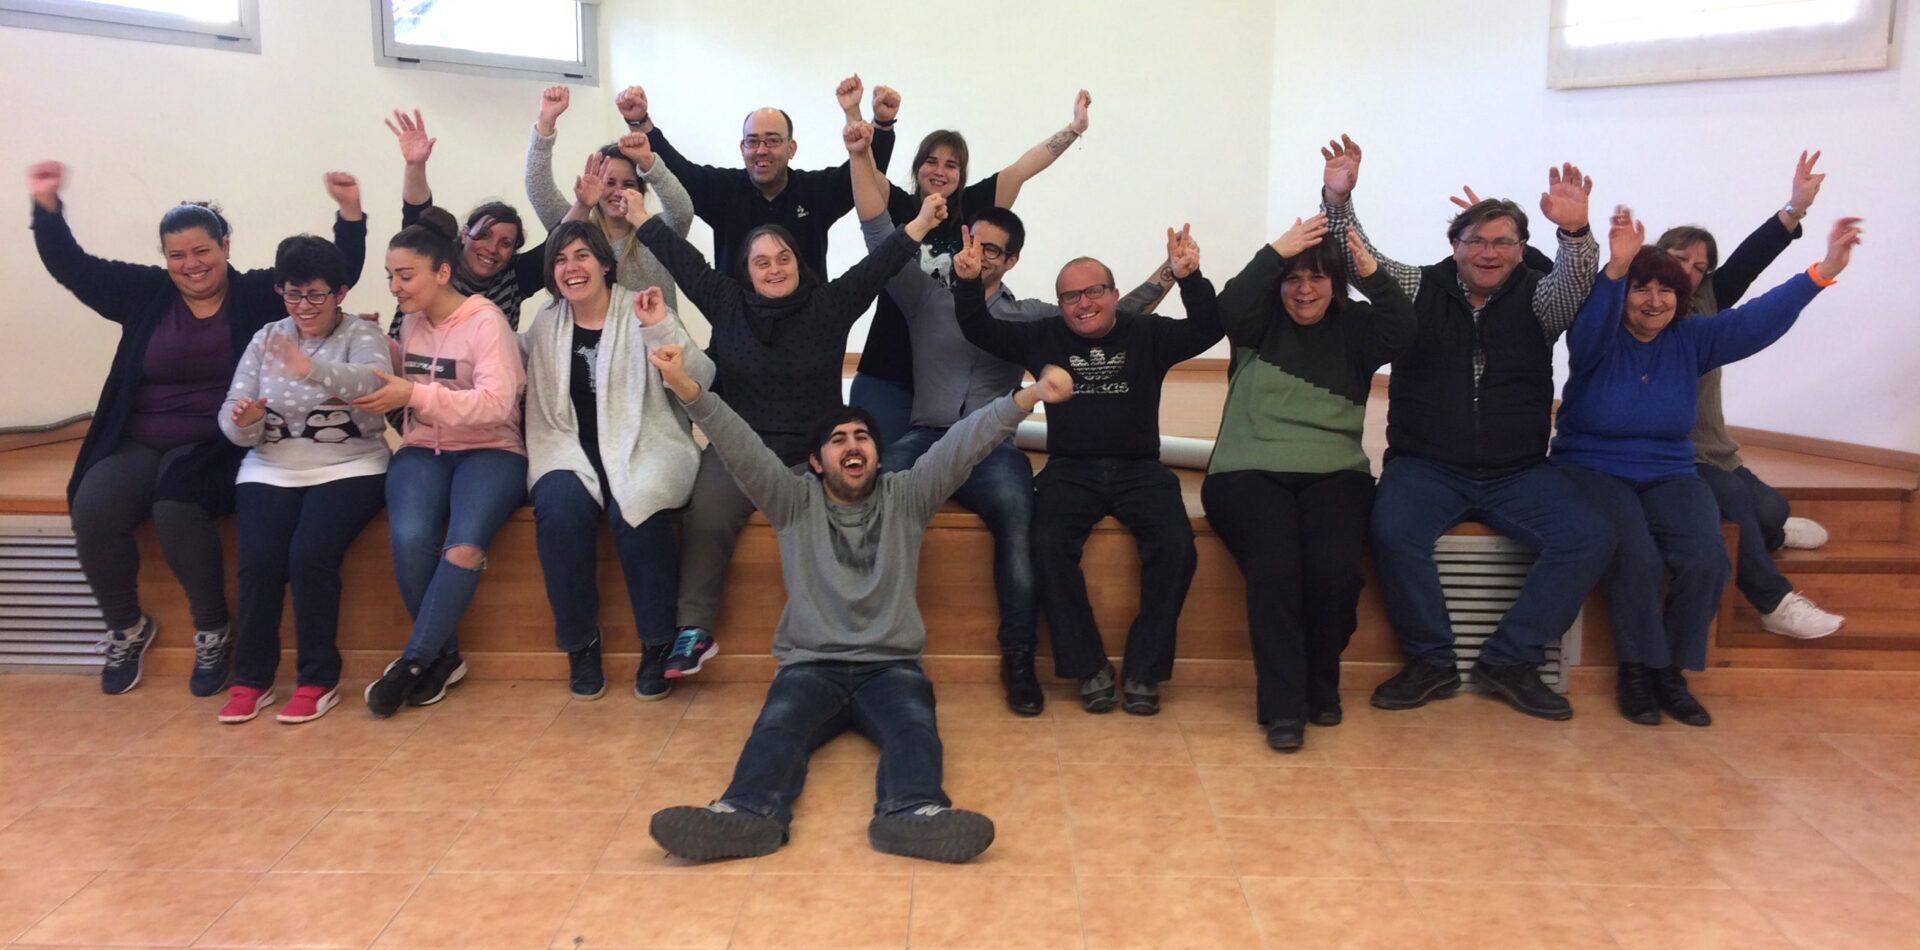 El Voluntariat de teatre, un treball en equip